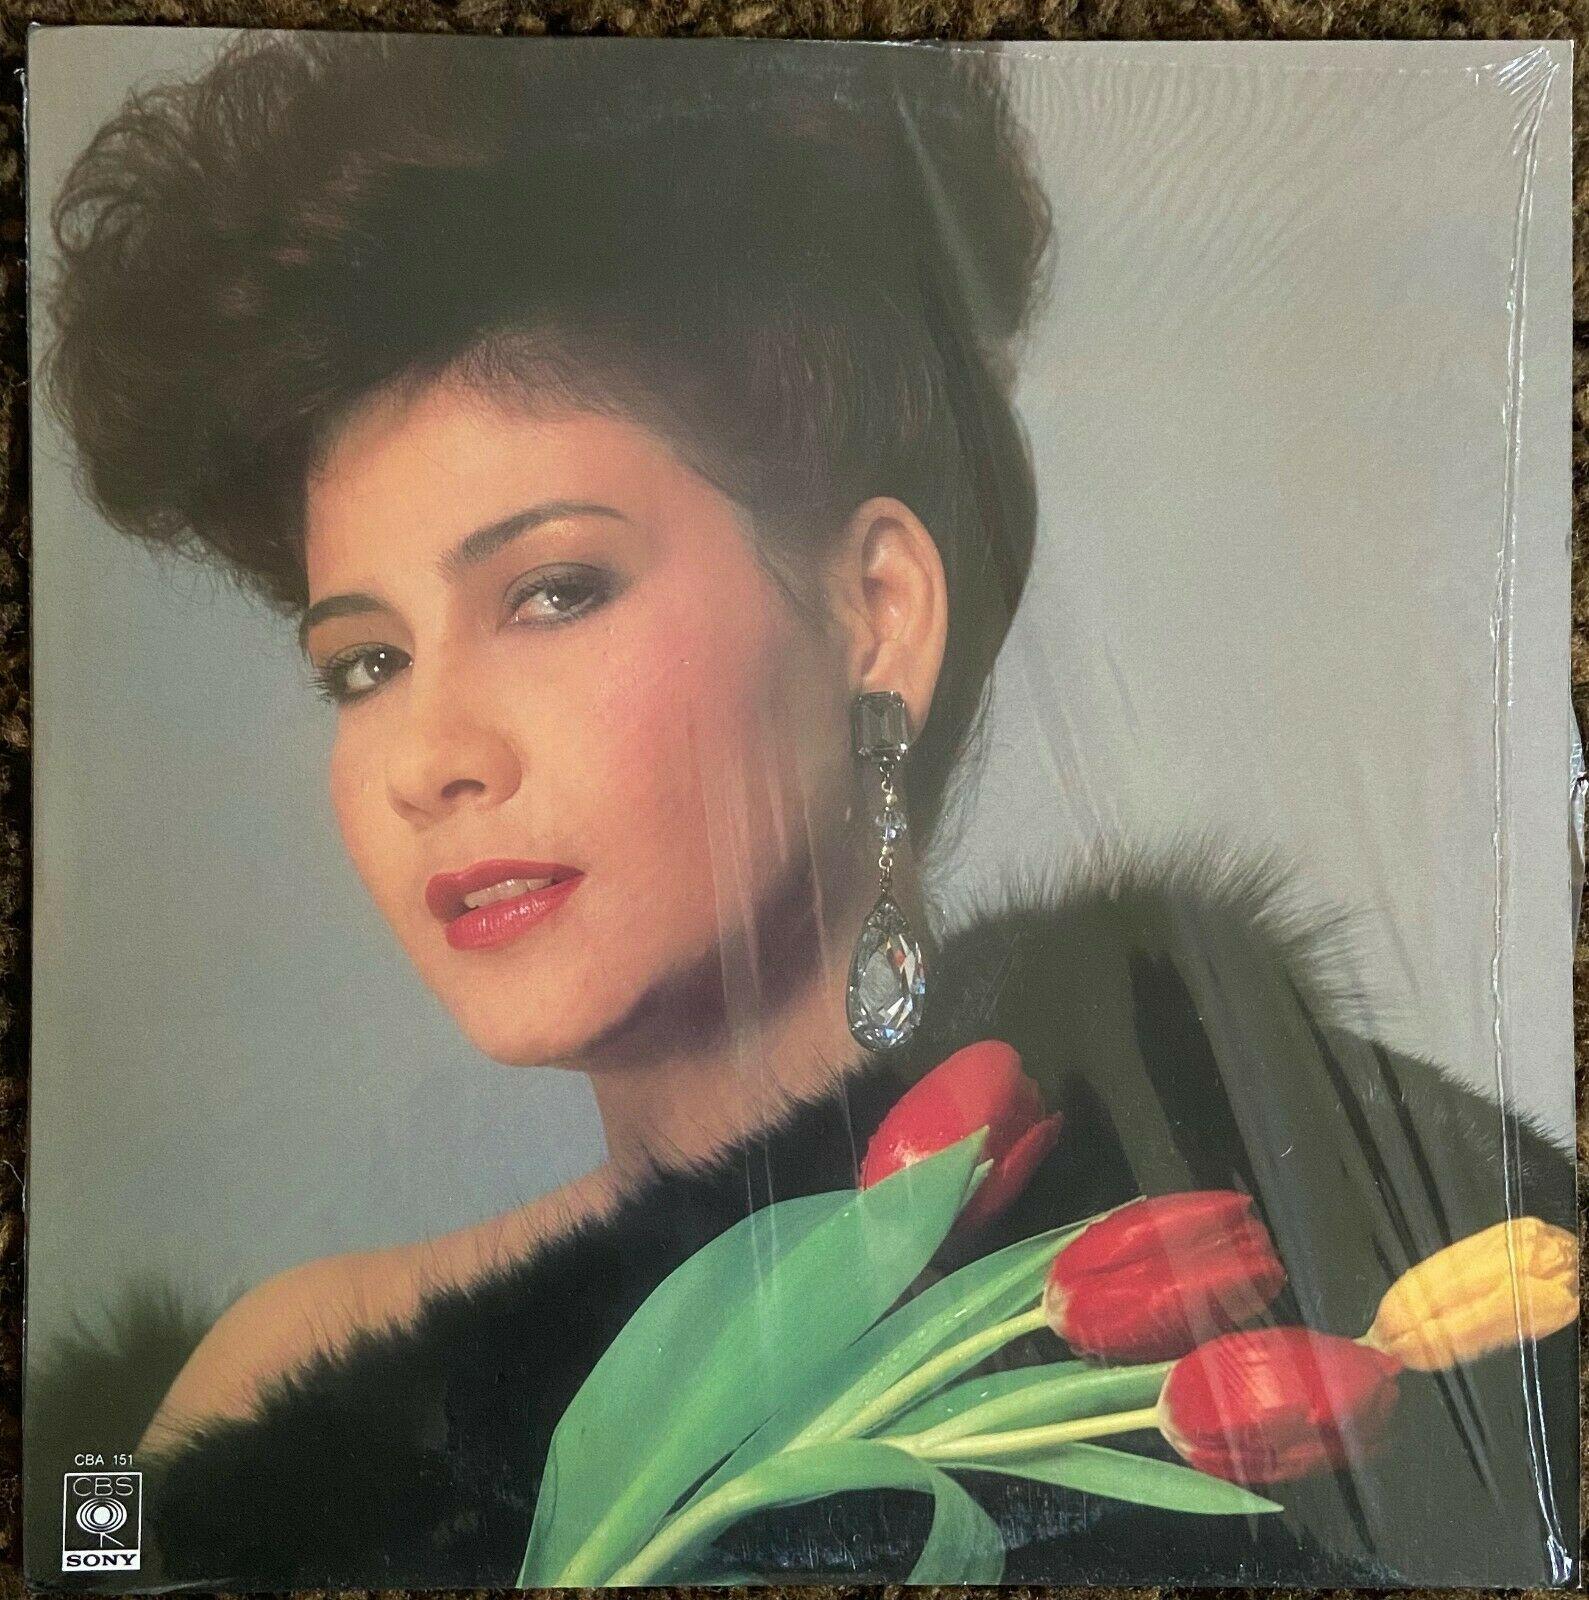 Jenny Tseng                             Sing For You  CBS Sony        CBA 151 CANTOPOP LP 1985  NM